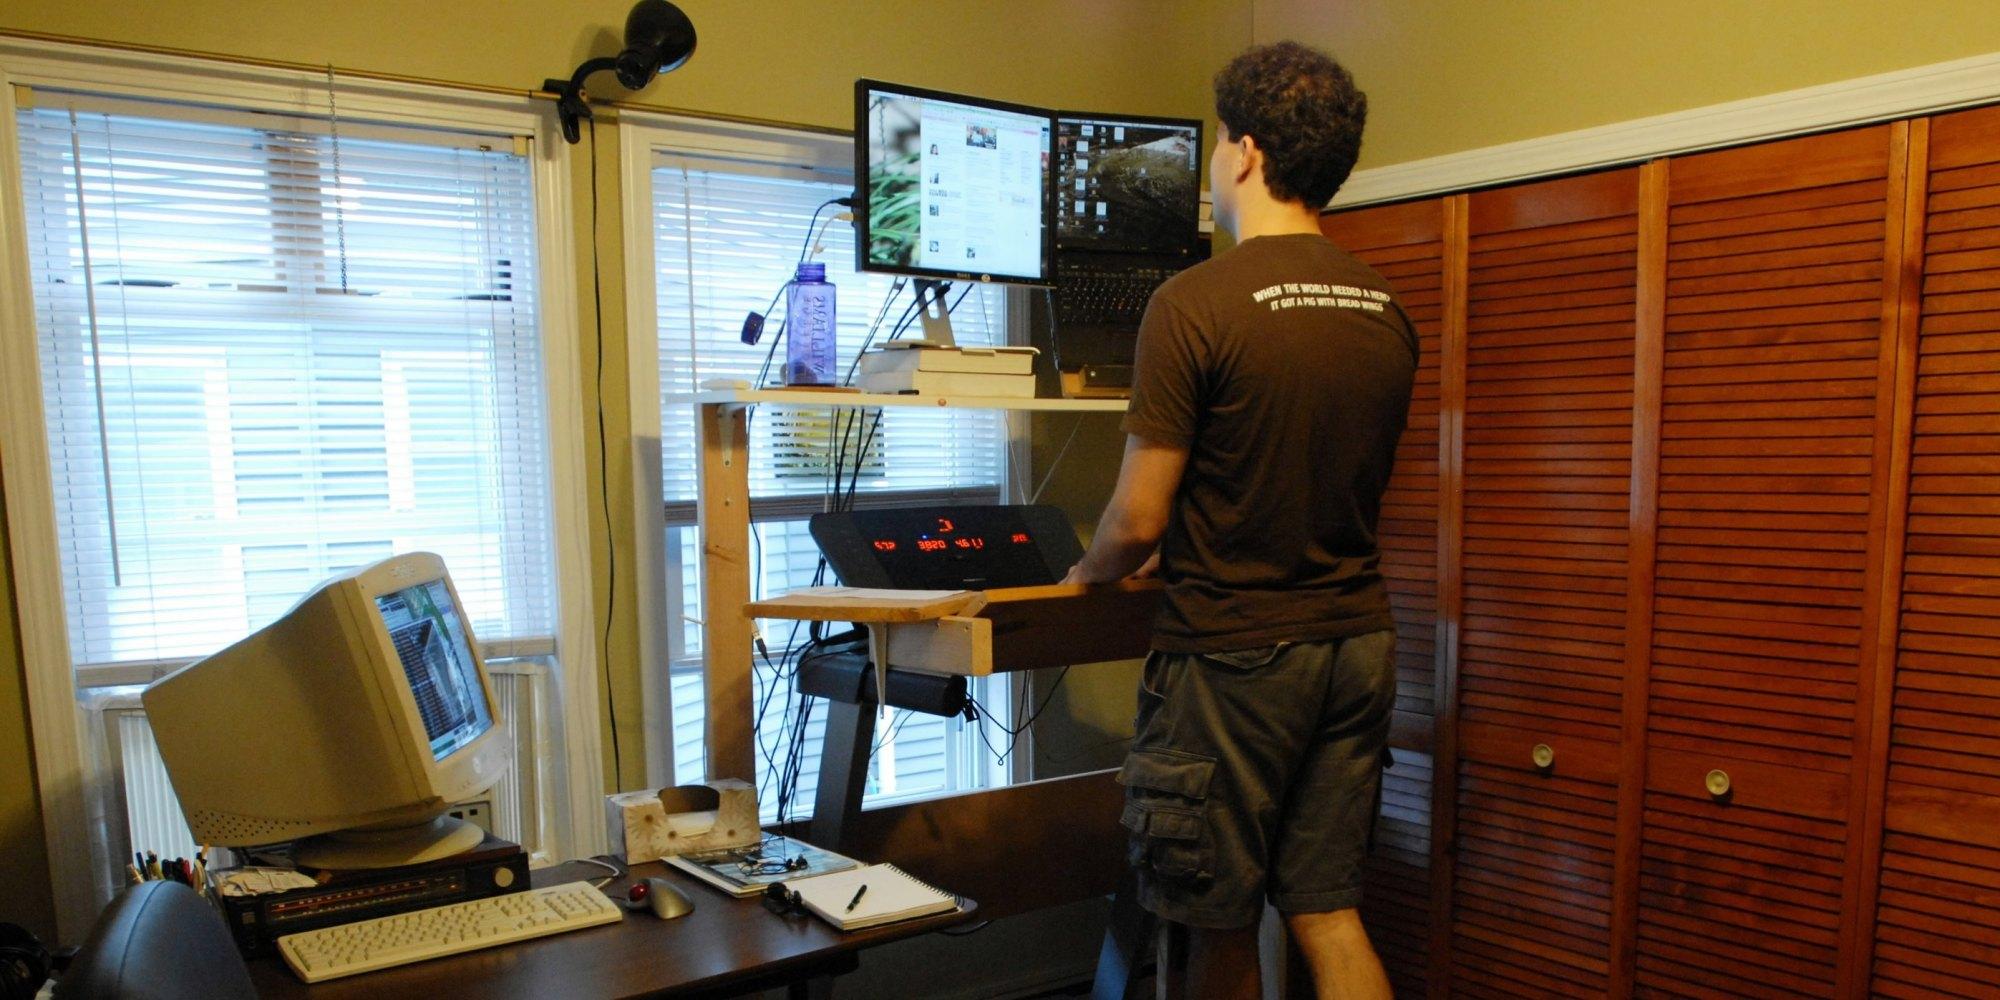 Treadmill Desks Burn Calories And Boost Work Performance